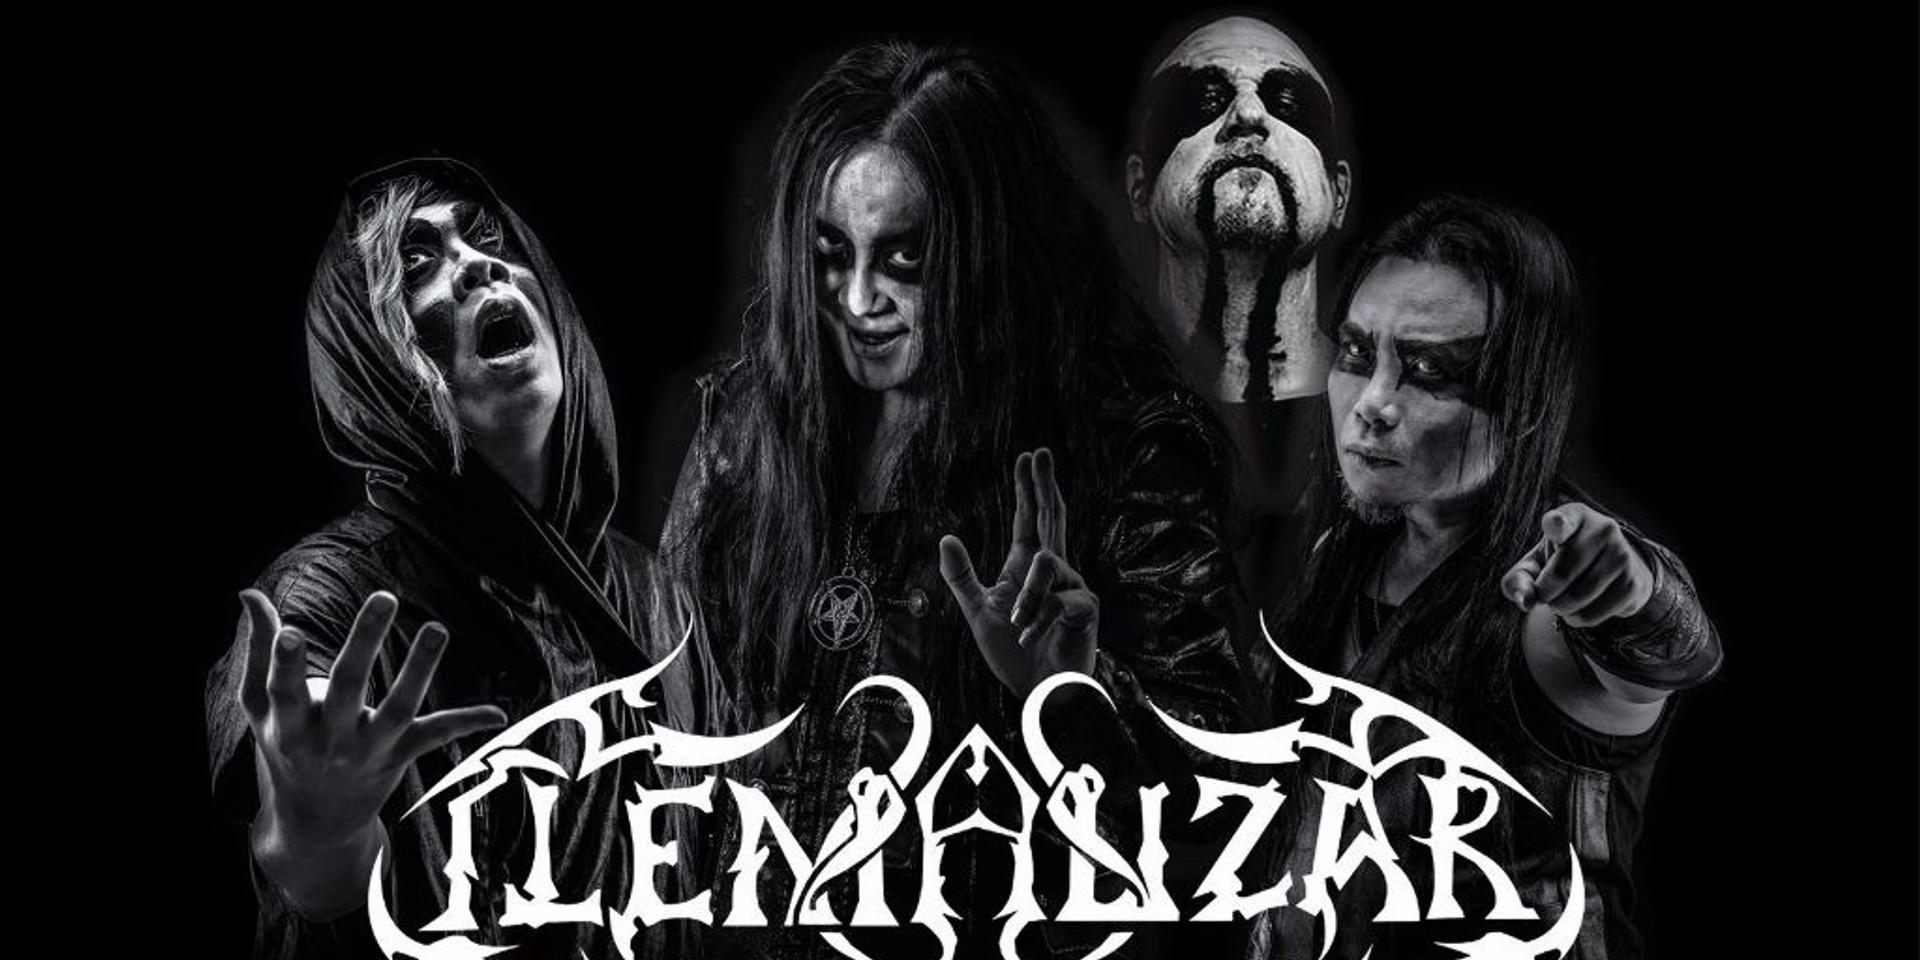 LISTEN: Black metal veterans Ilemauzar release first LP in 20 years